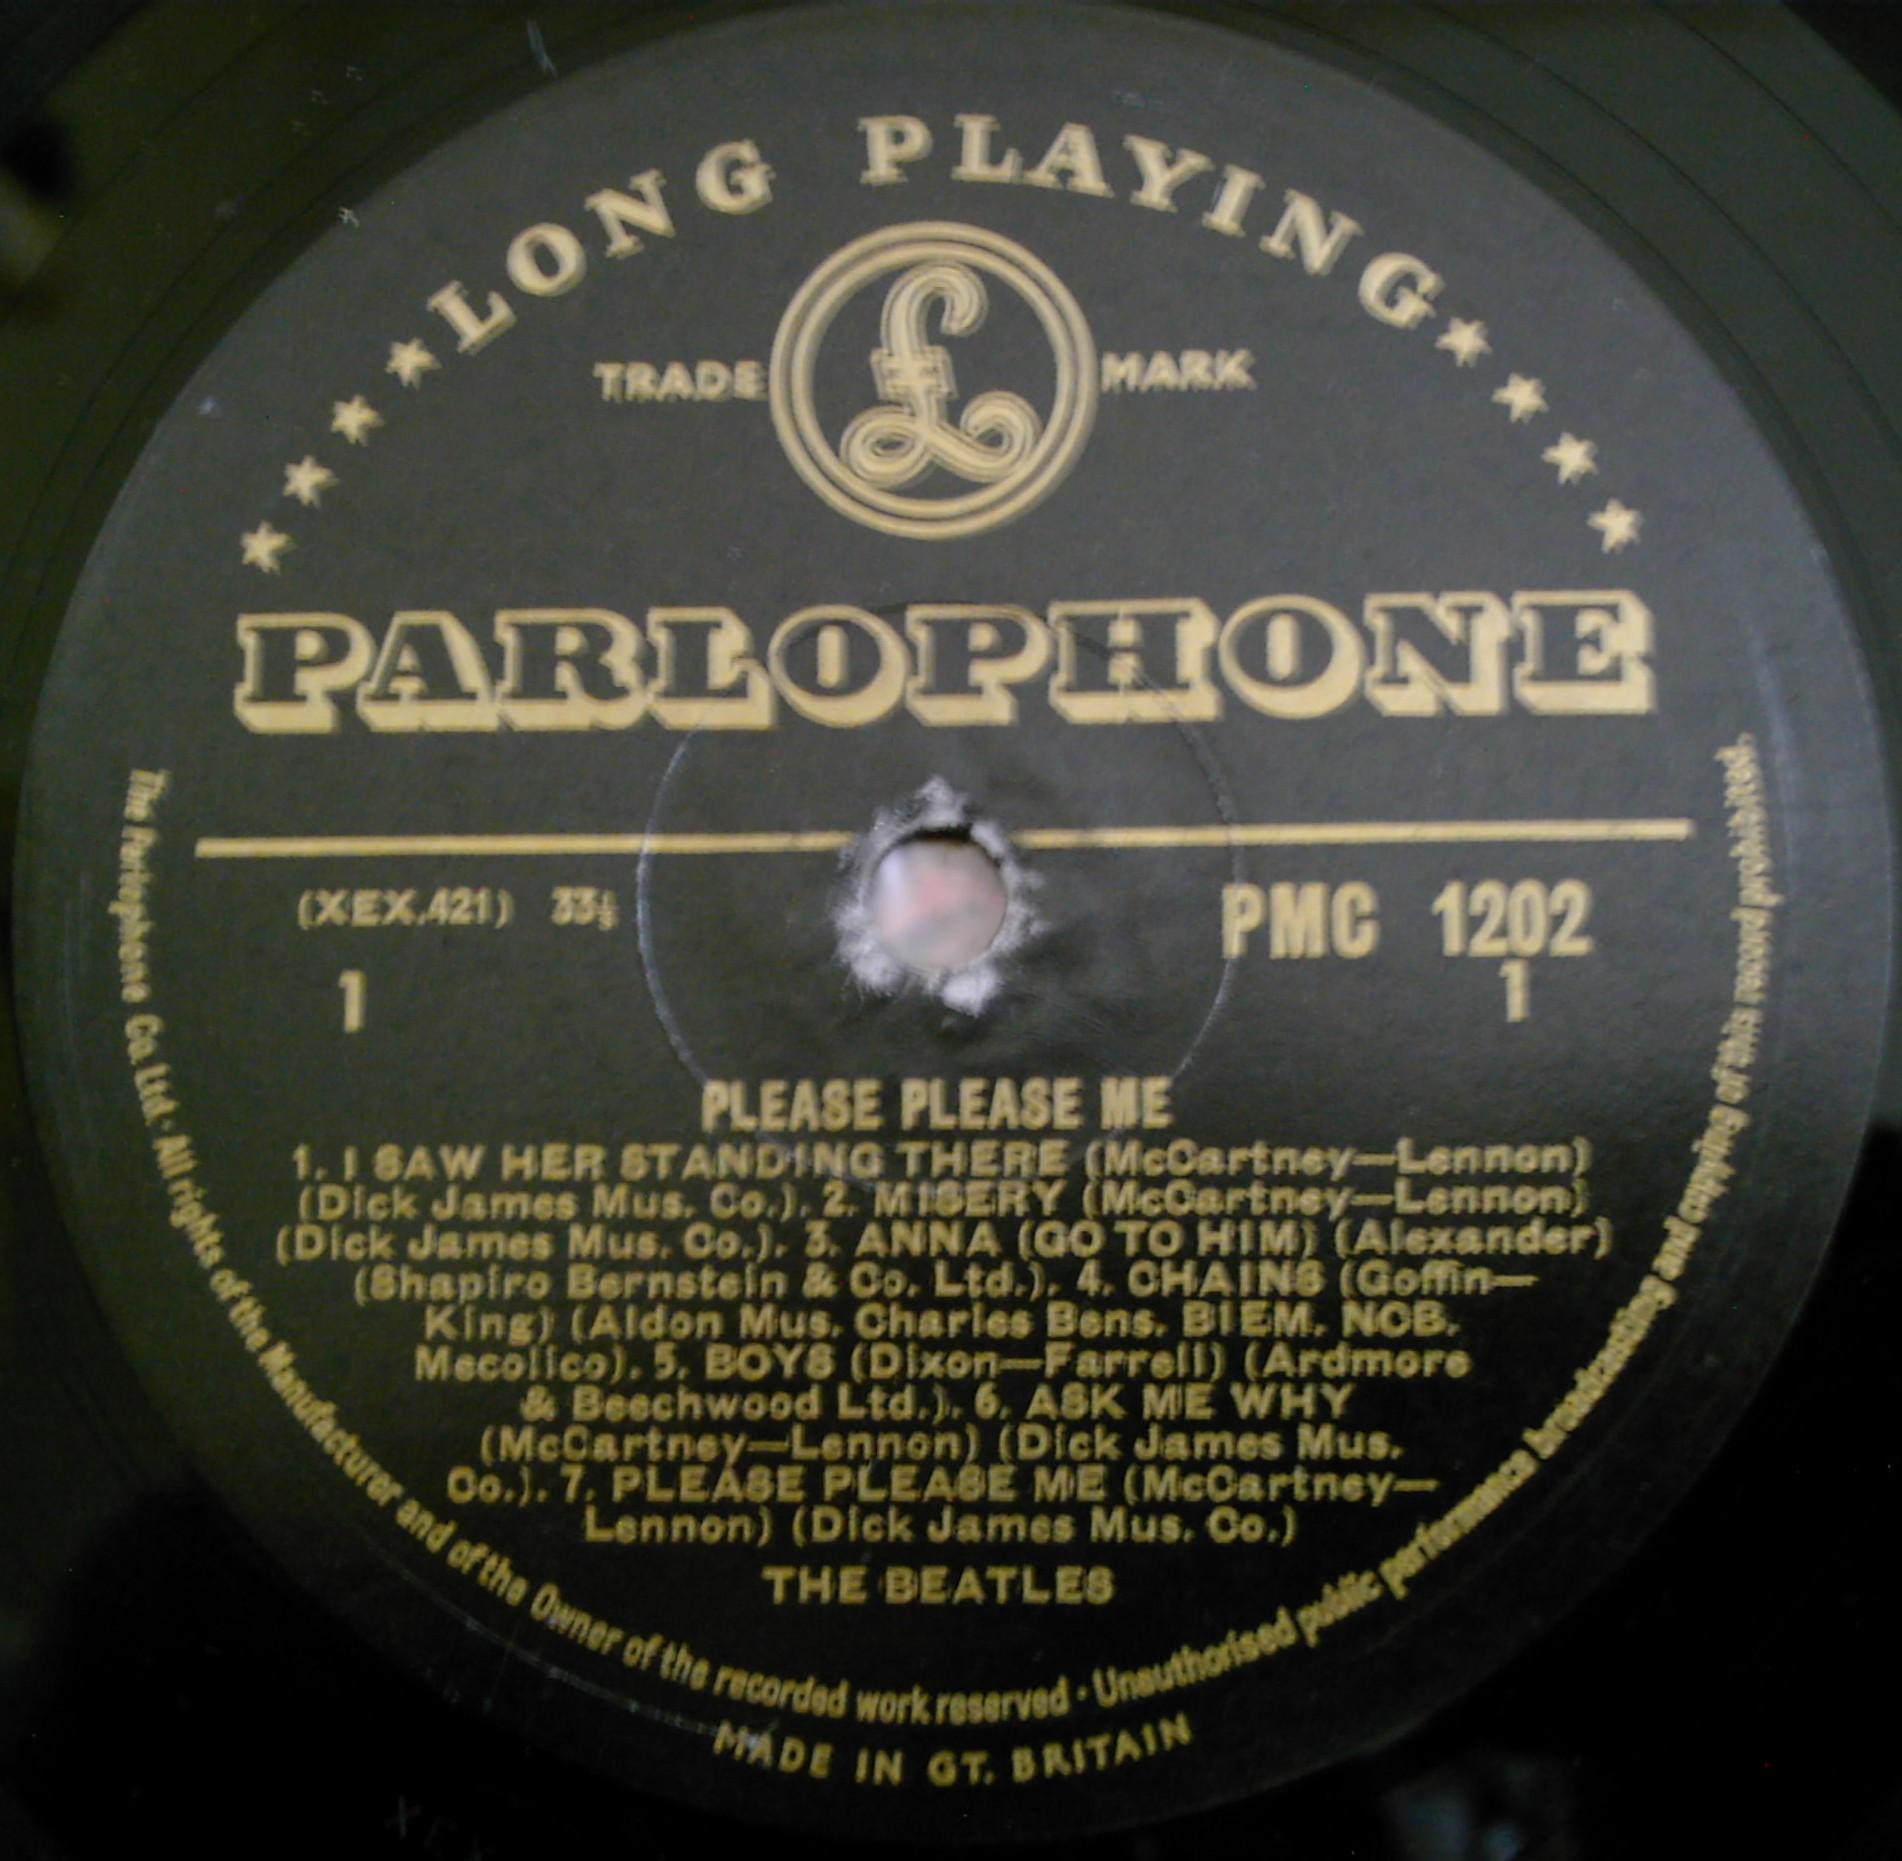 Parlophone LP PMC 1202.jpg